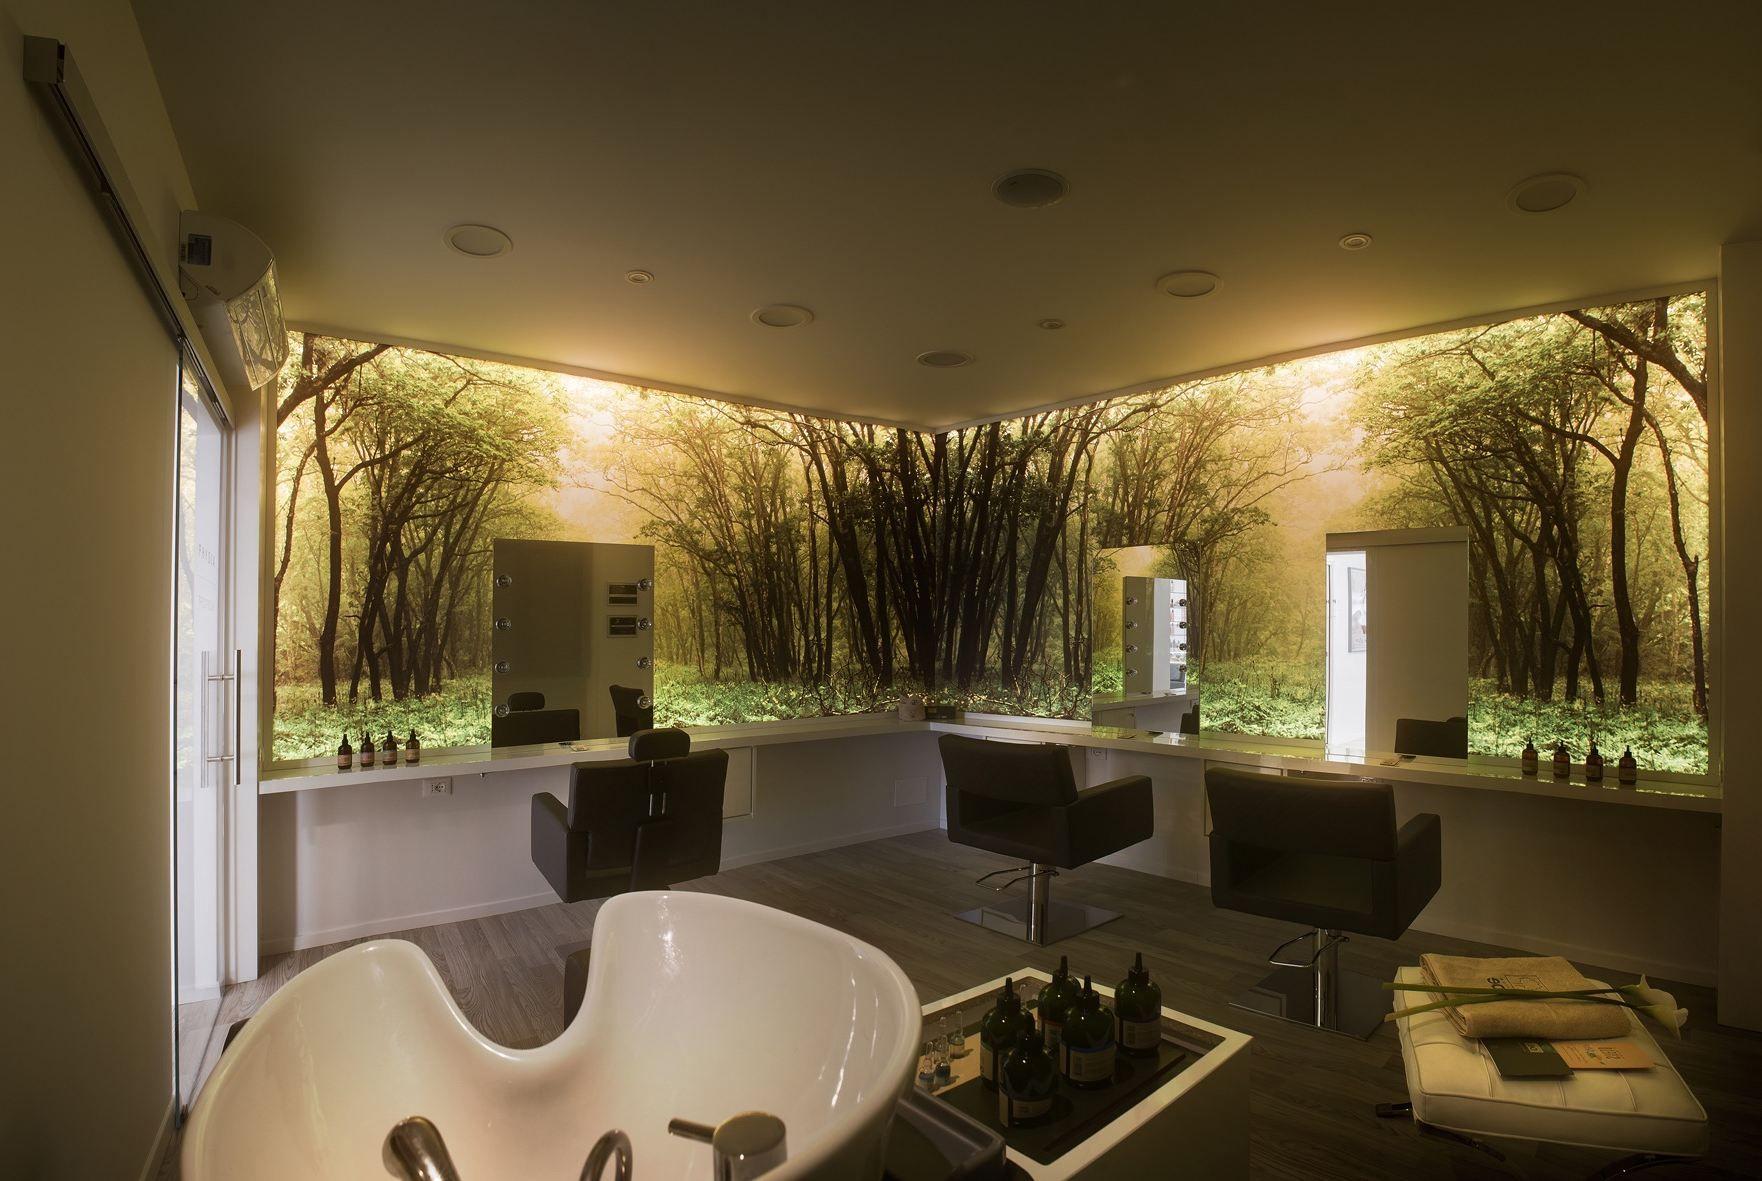 modern hair salon design ideas interior design for house salon rh pinterest com  modern hair salon design ideas